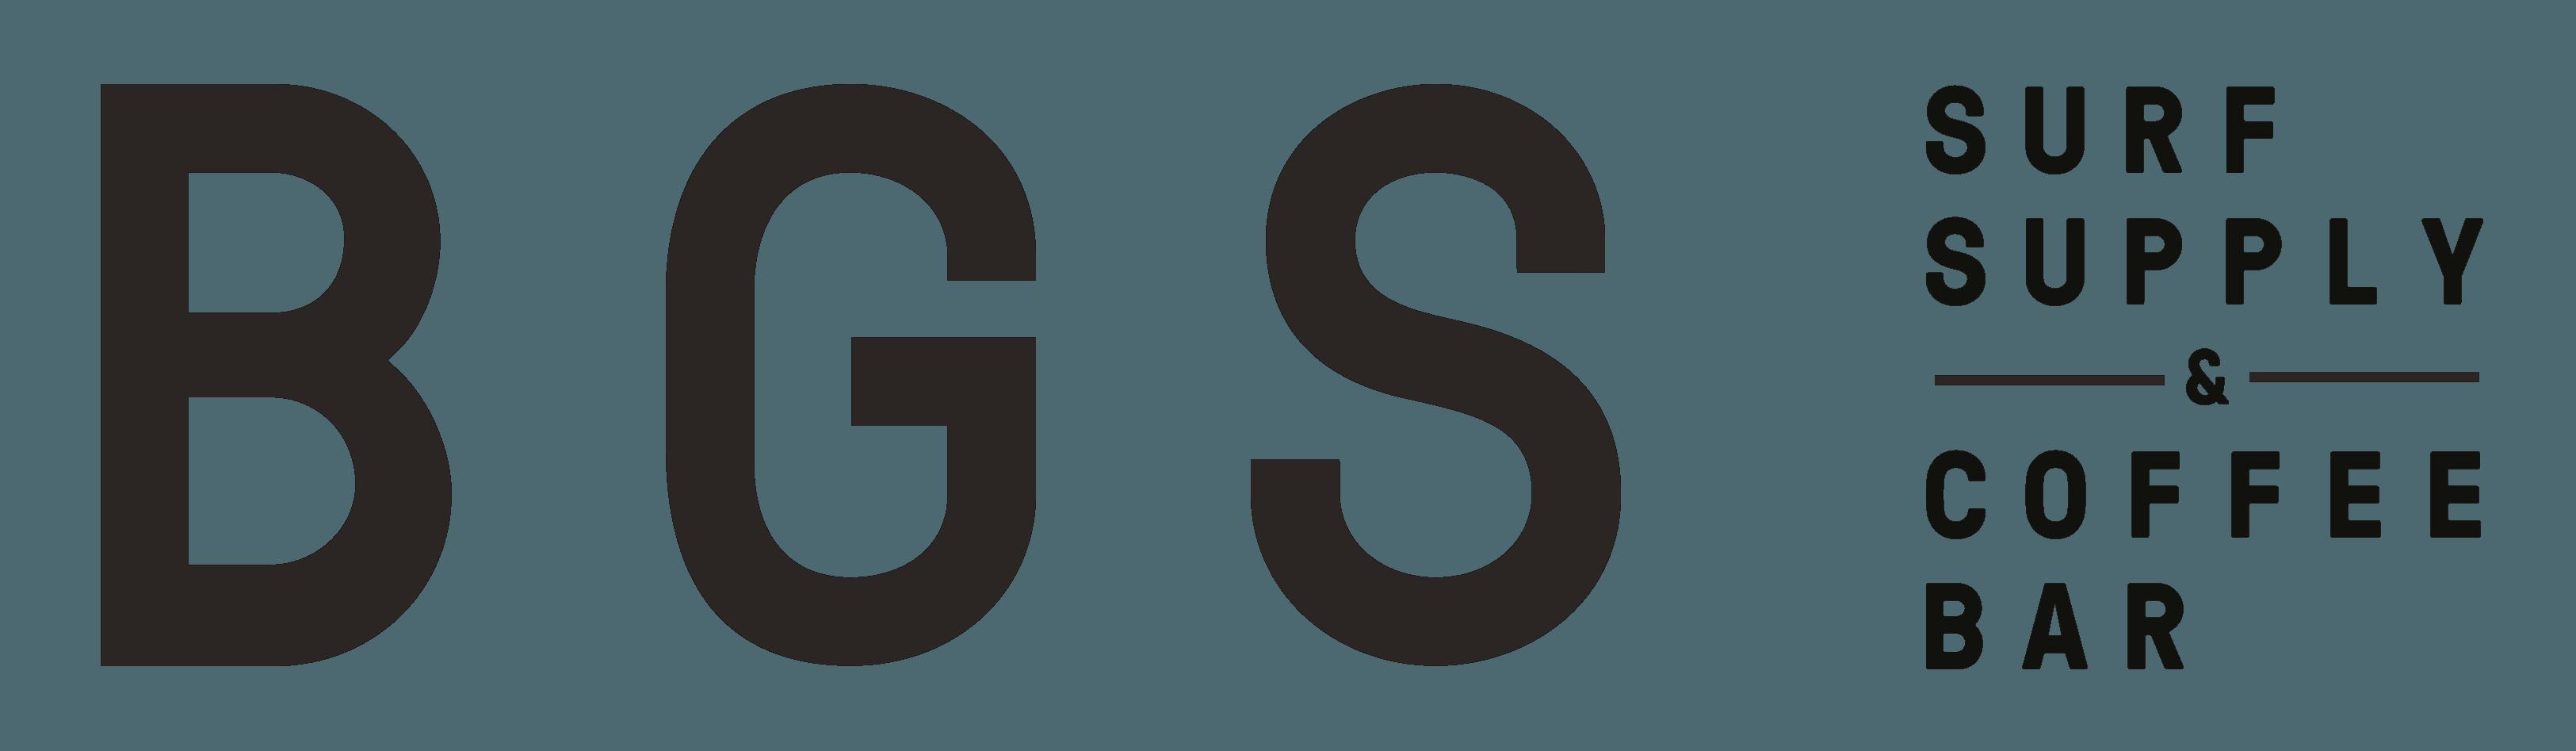 logo bgs bali surf supply and coffee bar